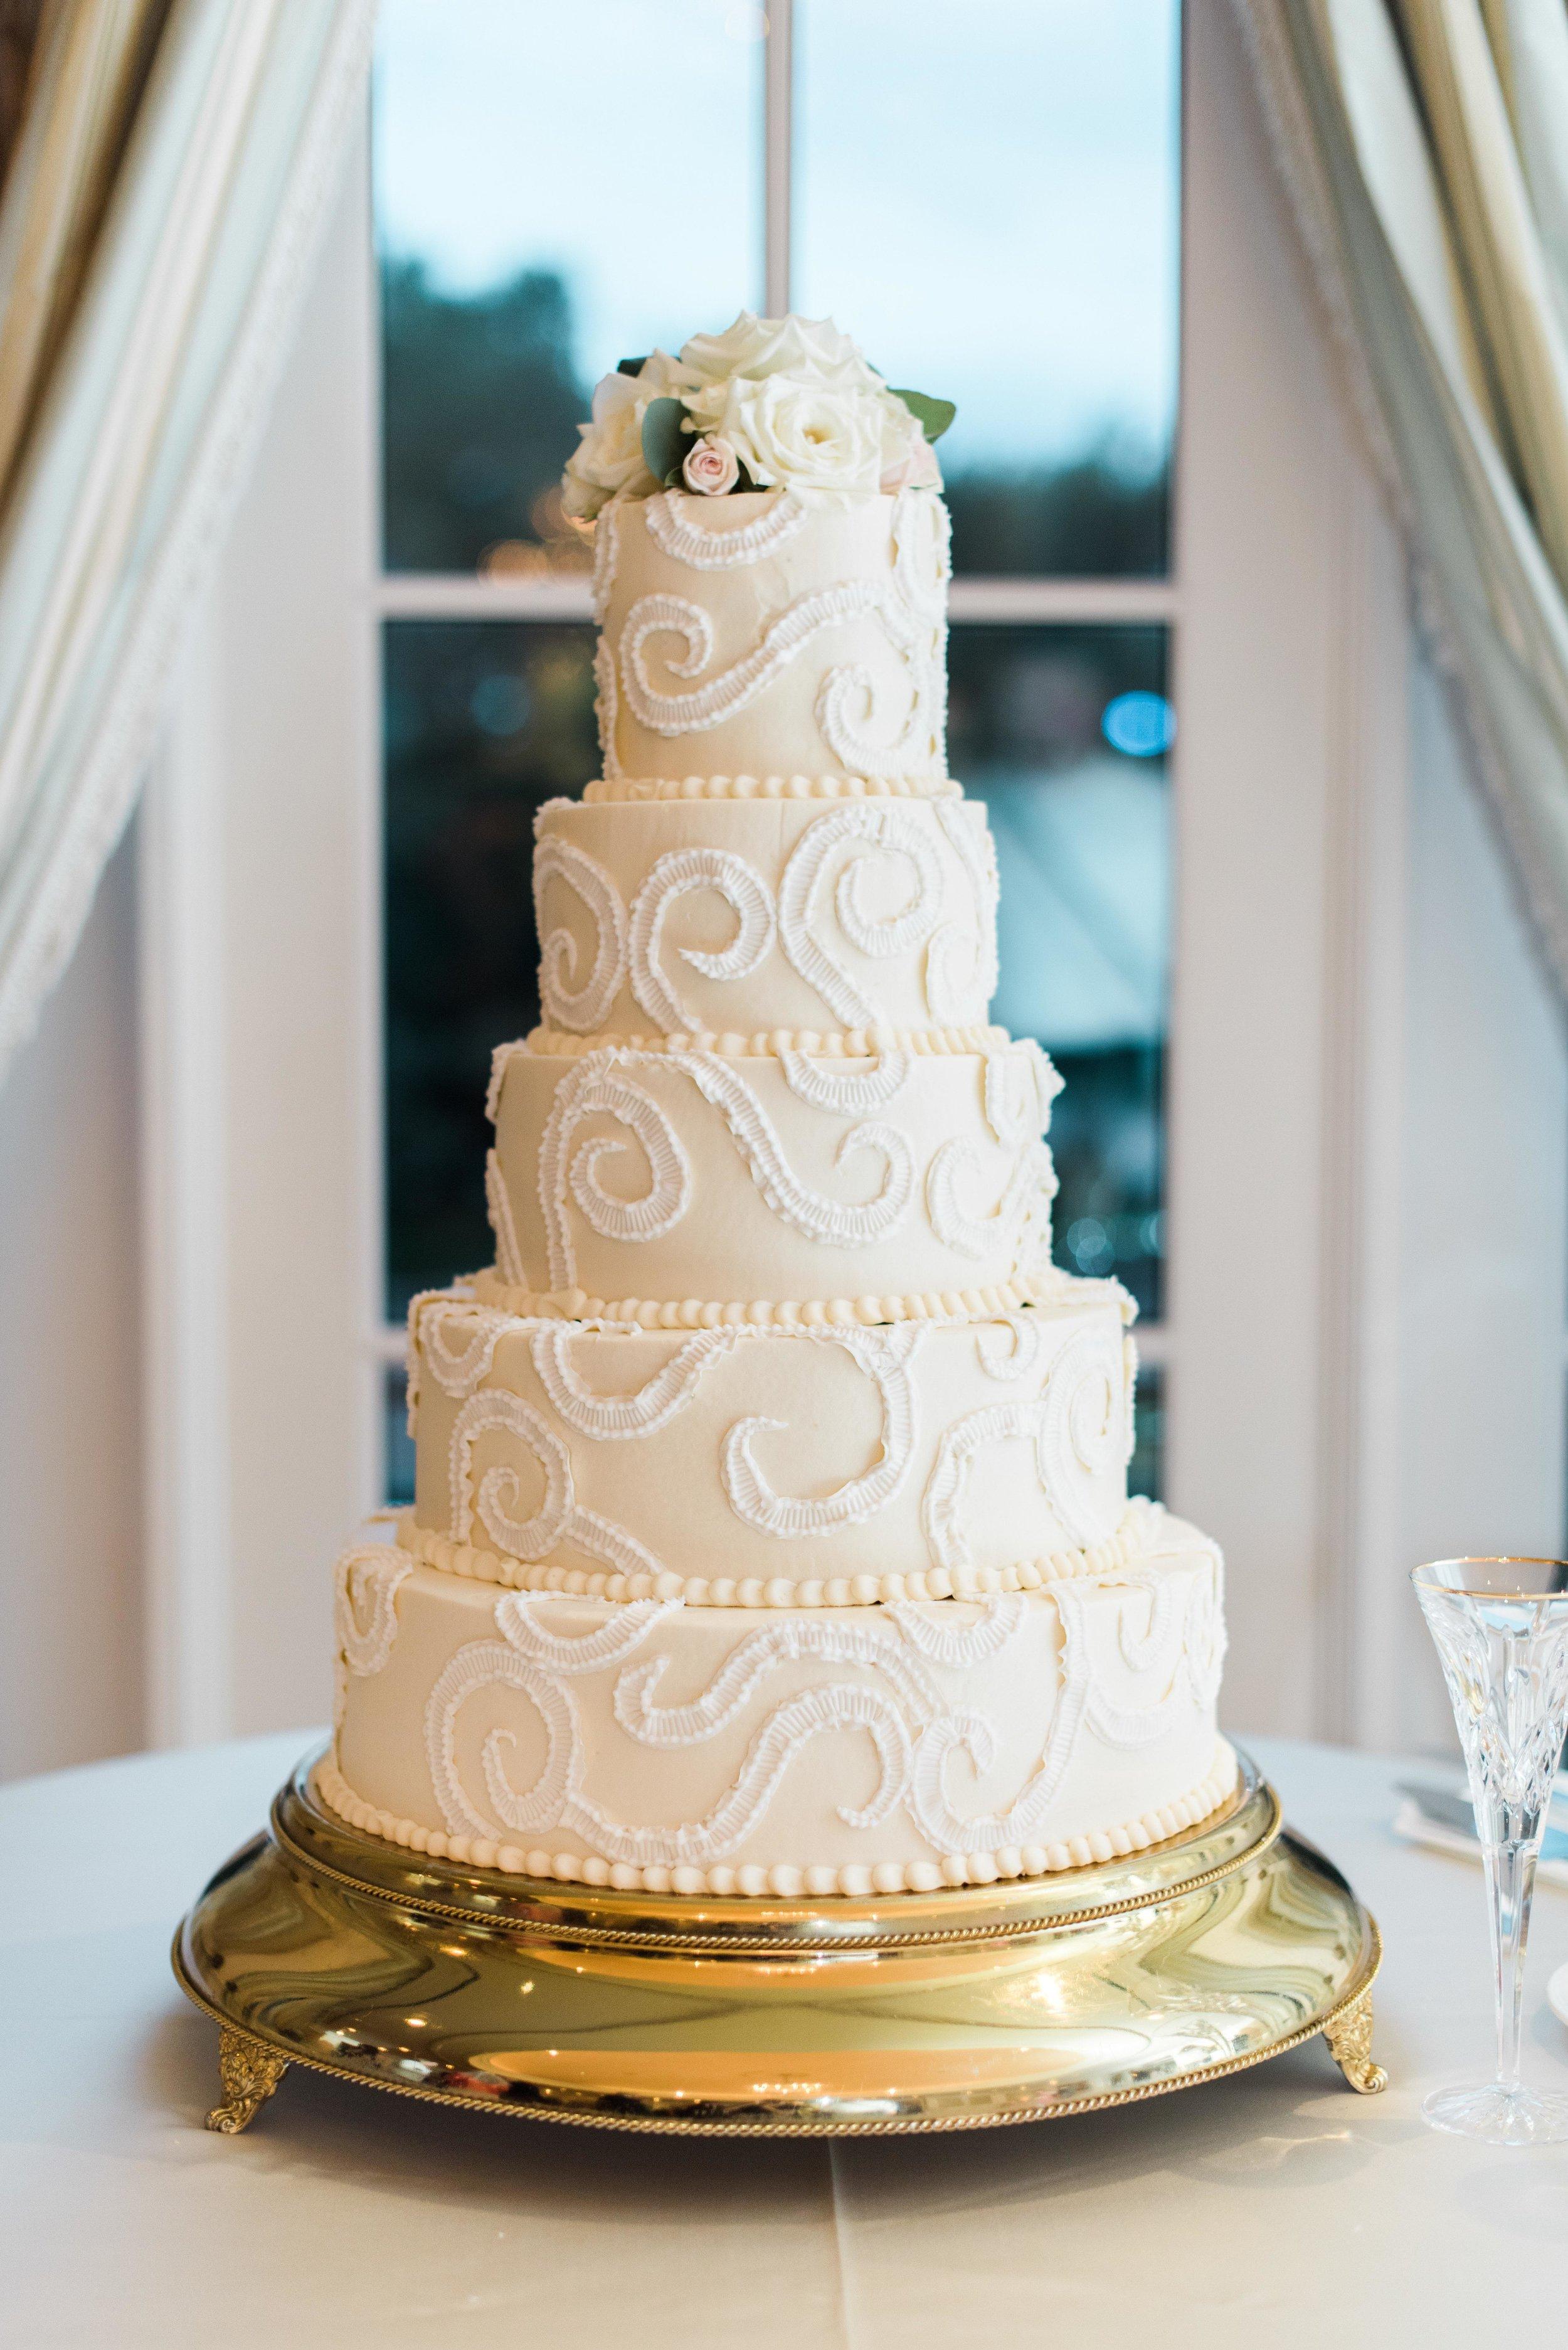 Fine-Art-Film-Houston-Wedding-Photographer-Best-Top-Luxury-Texas-Austin-Dallas-Destination-Dana-Fernandez-Photography-River-Oaks-Country-Club-South-Main-Baptist-Ceremony-Reception-Wedding-18.jpg